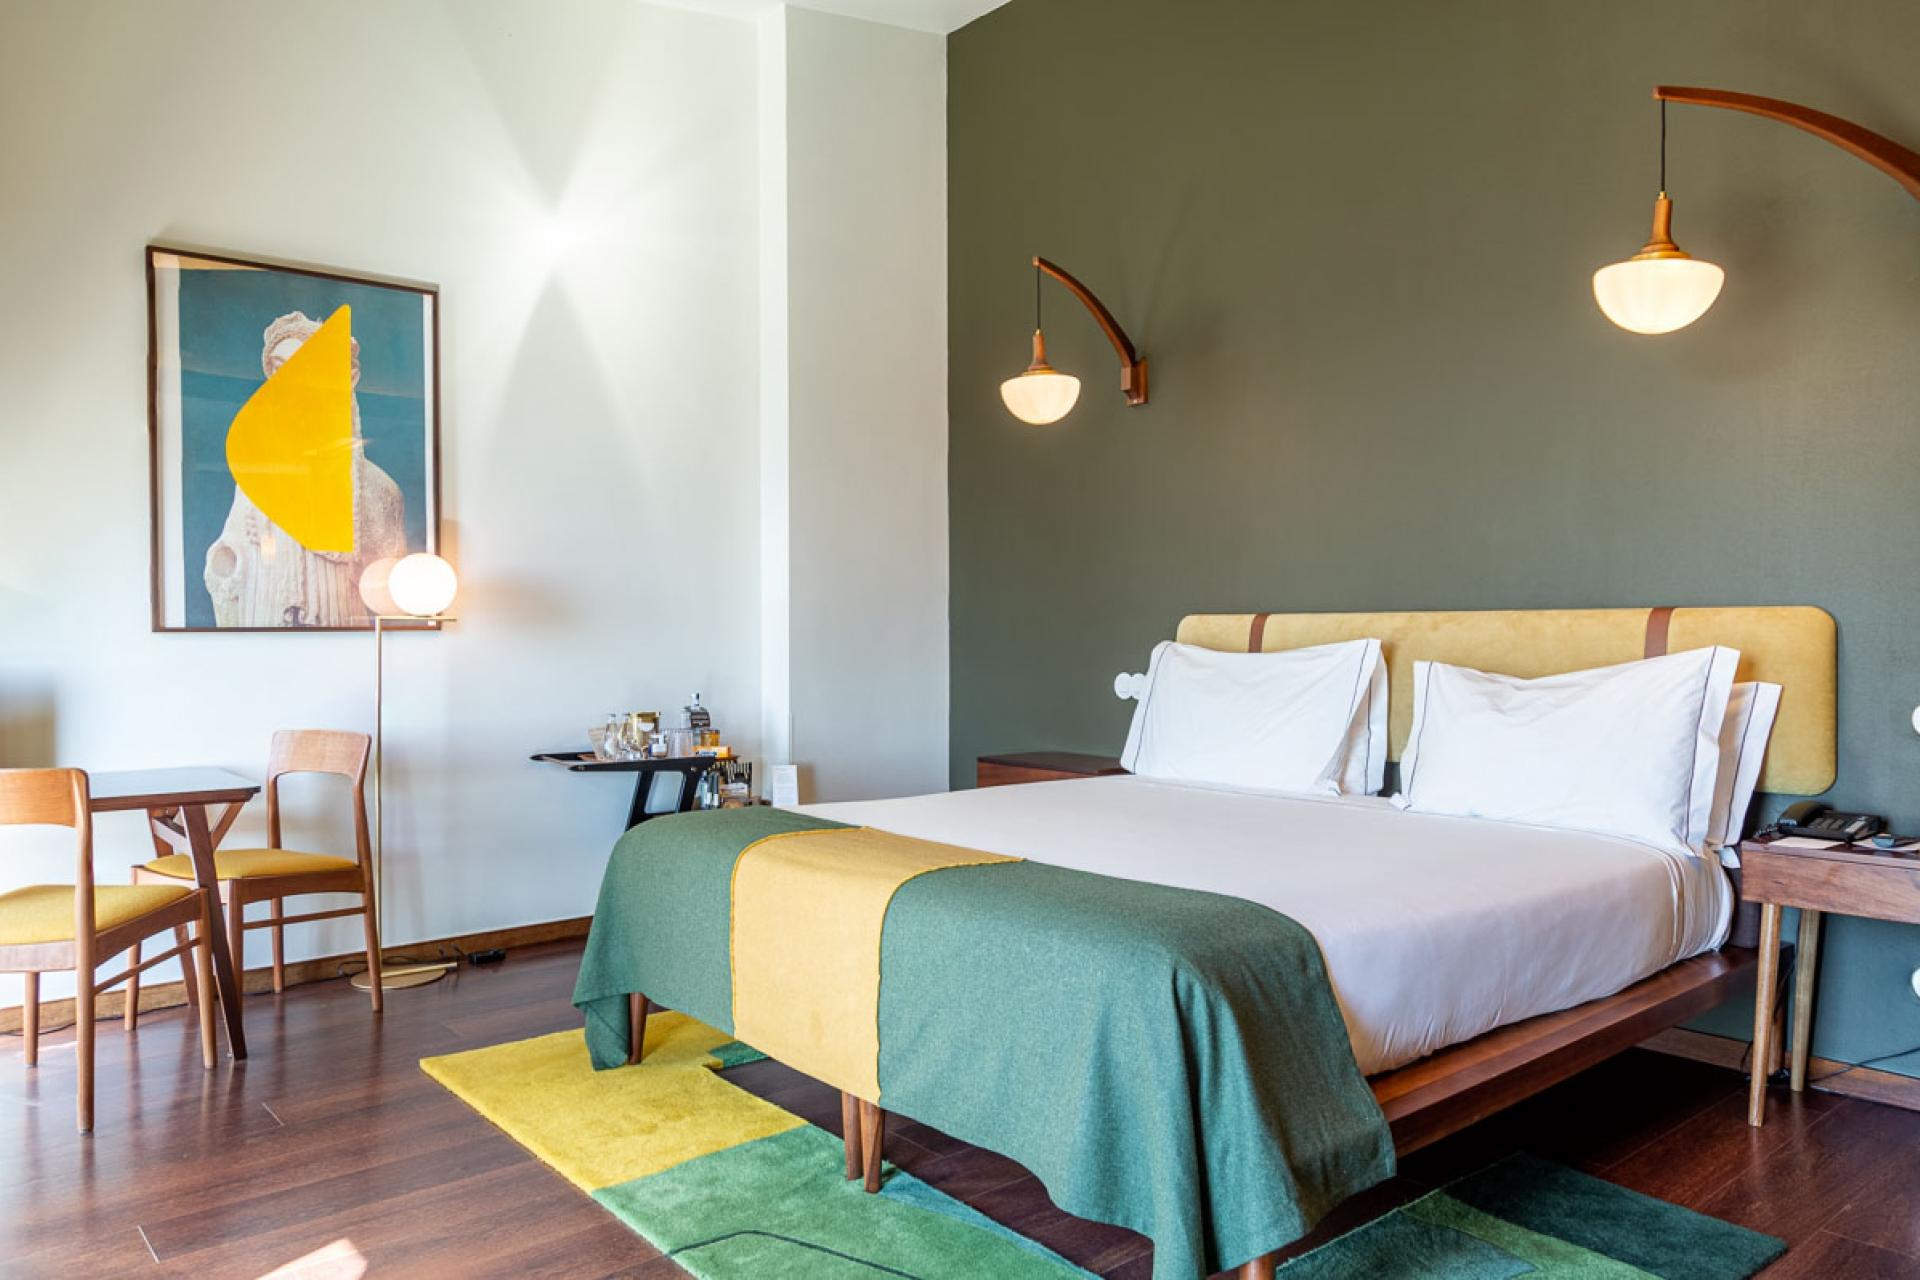 LisboaCool_Dormir_The_Vintage_Hotel&Spa